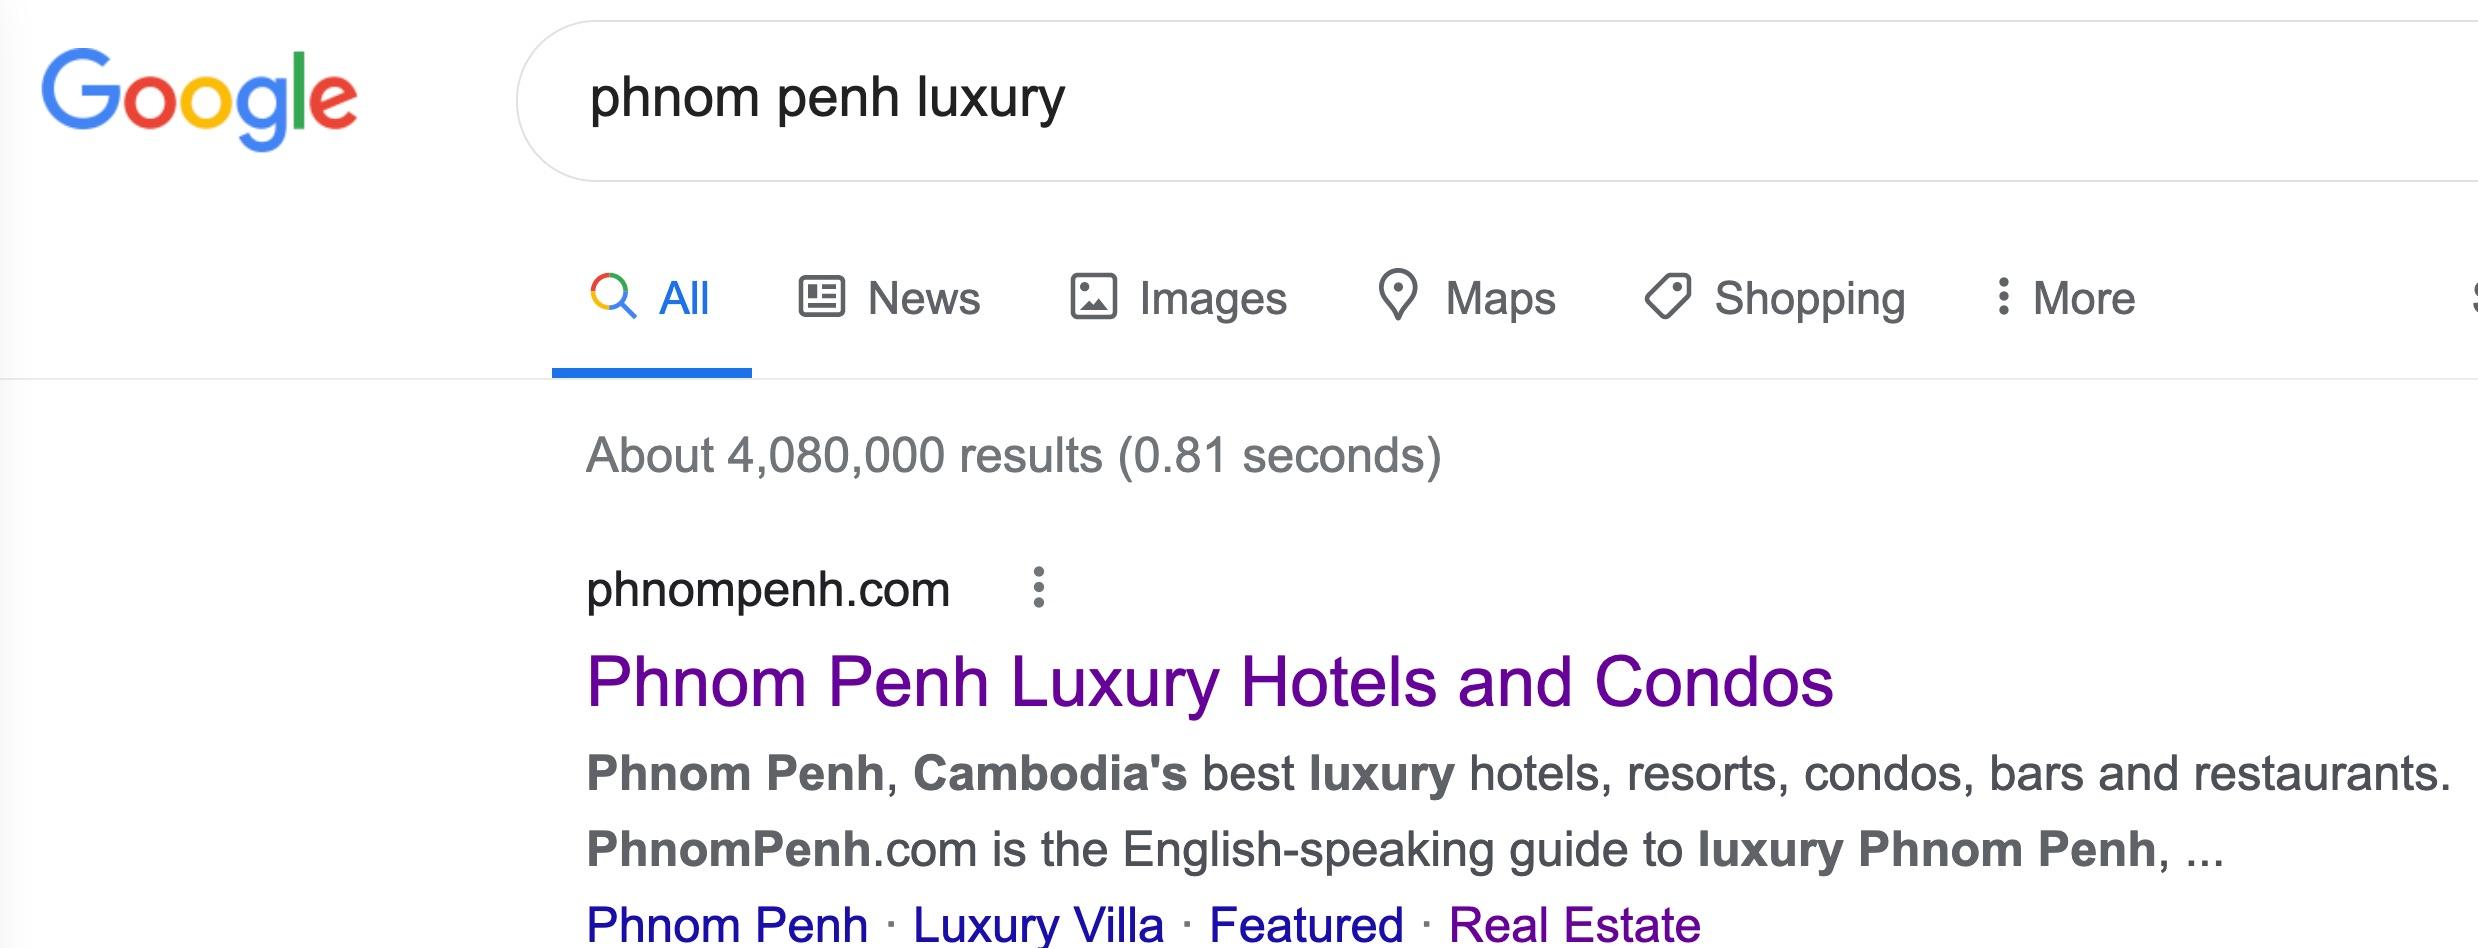 Phnom Penh luxury